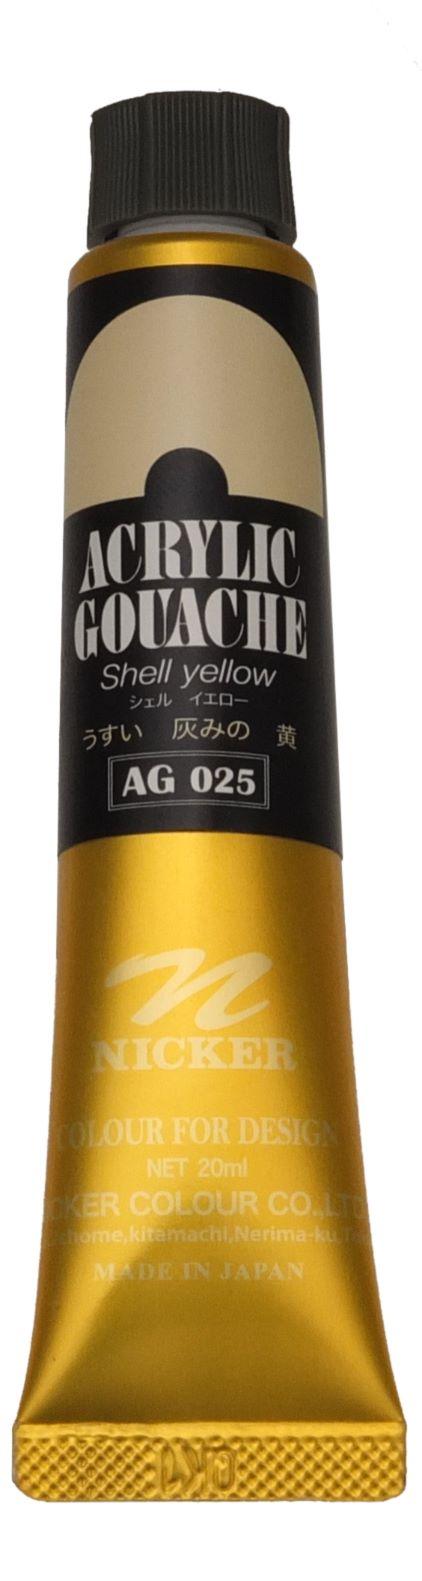 ACRYLIC GOUACHE 20ml AG025 SHELL YELLOW